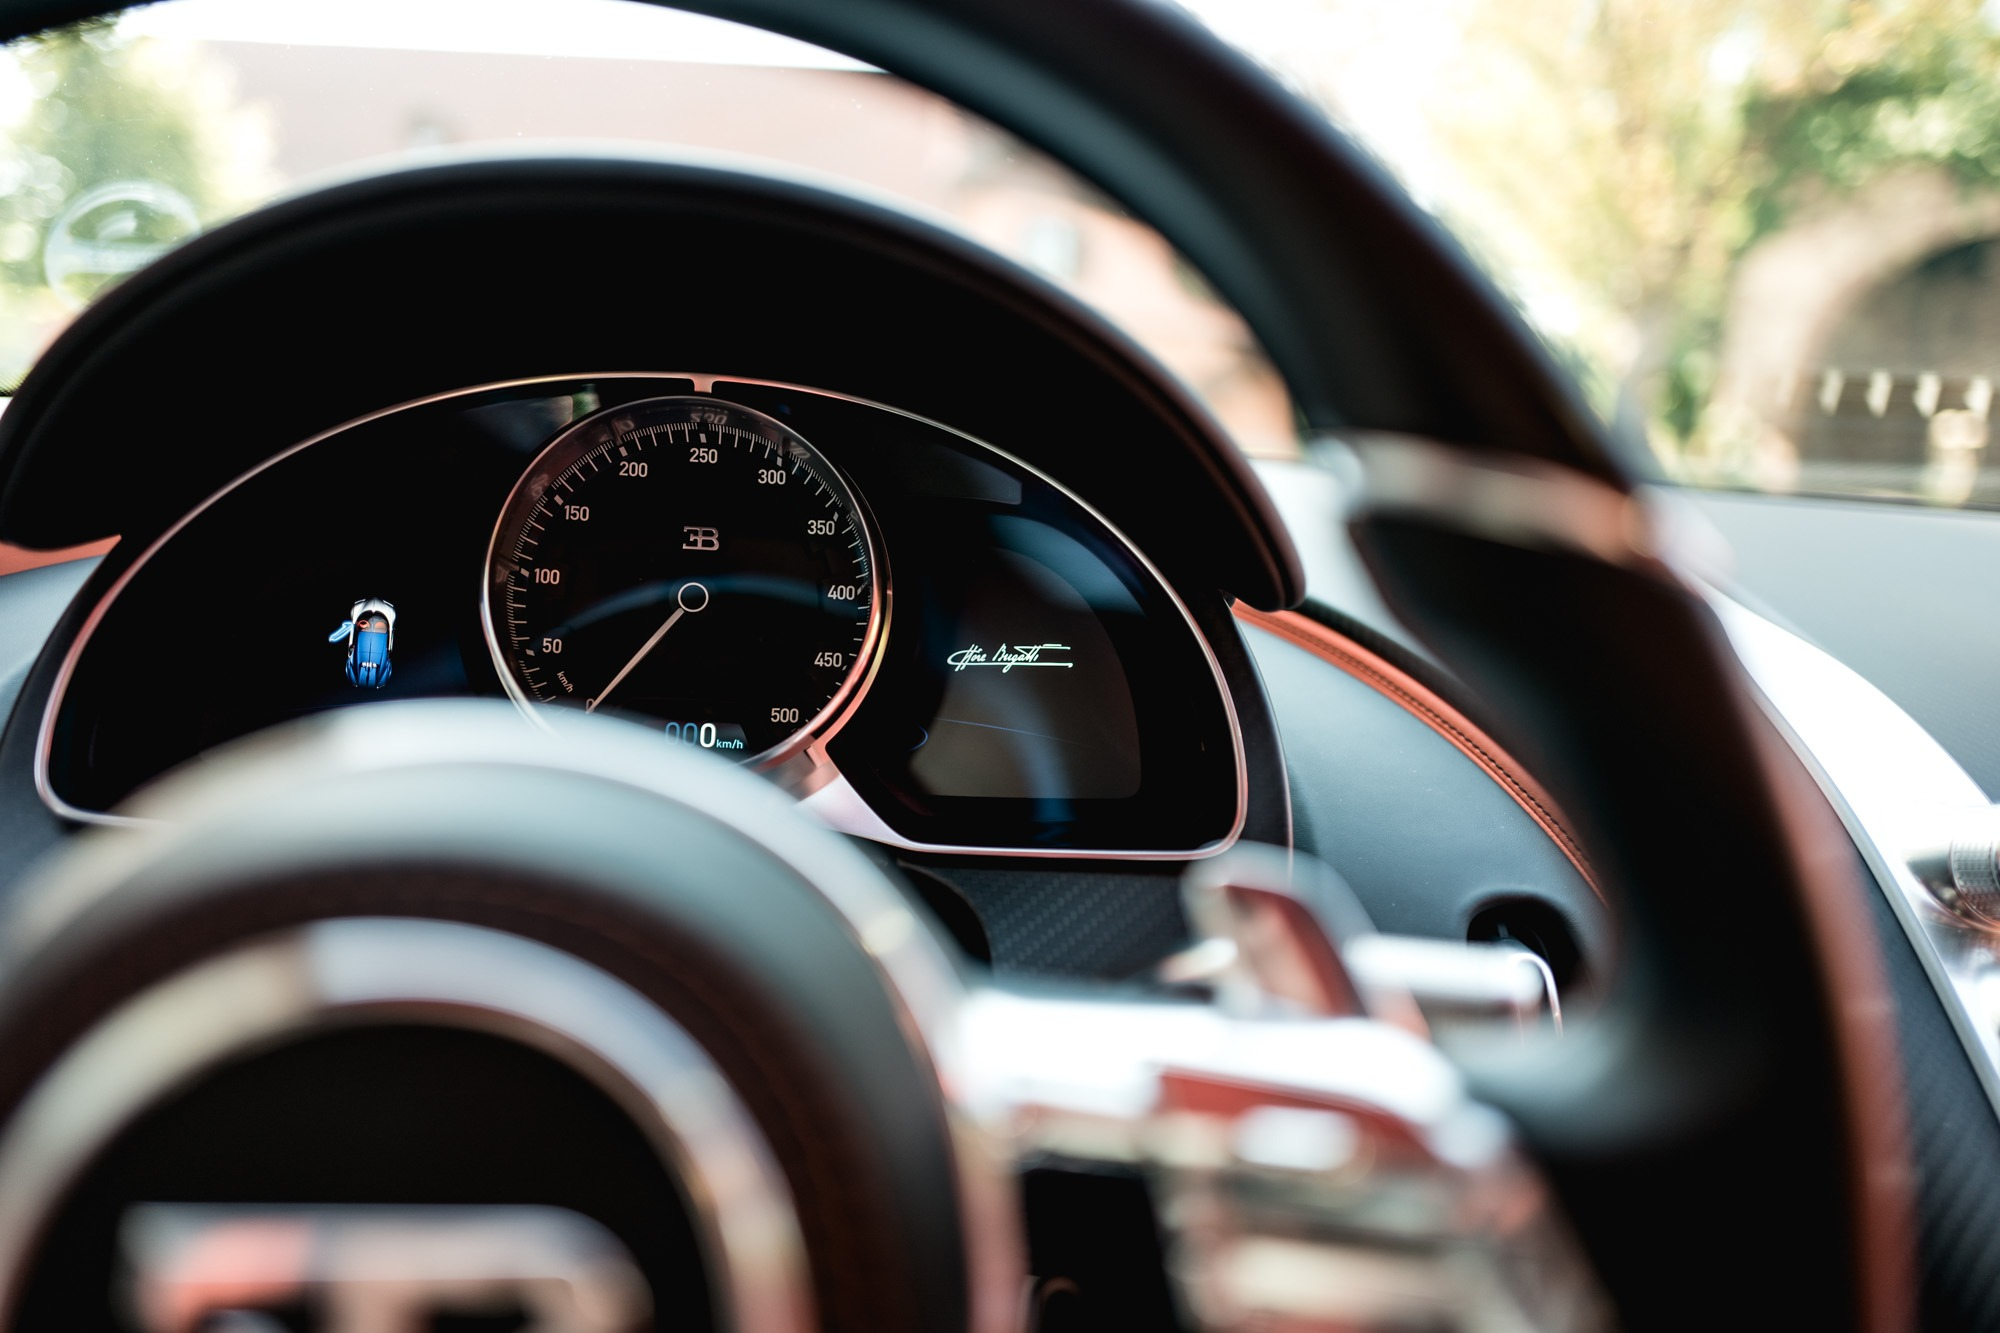 Ateliers Bugatti à Molsheim - Bugatti Chiron -Compteur de vitesse